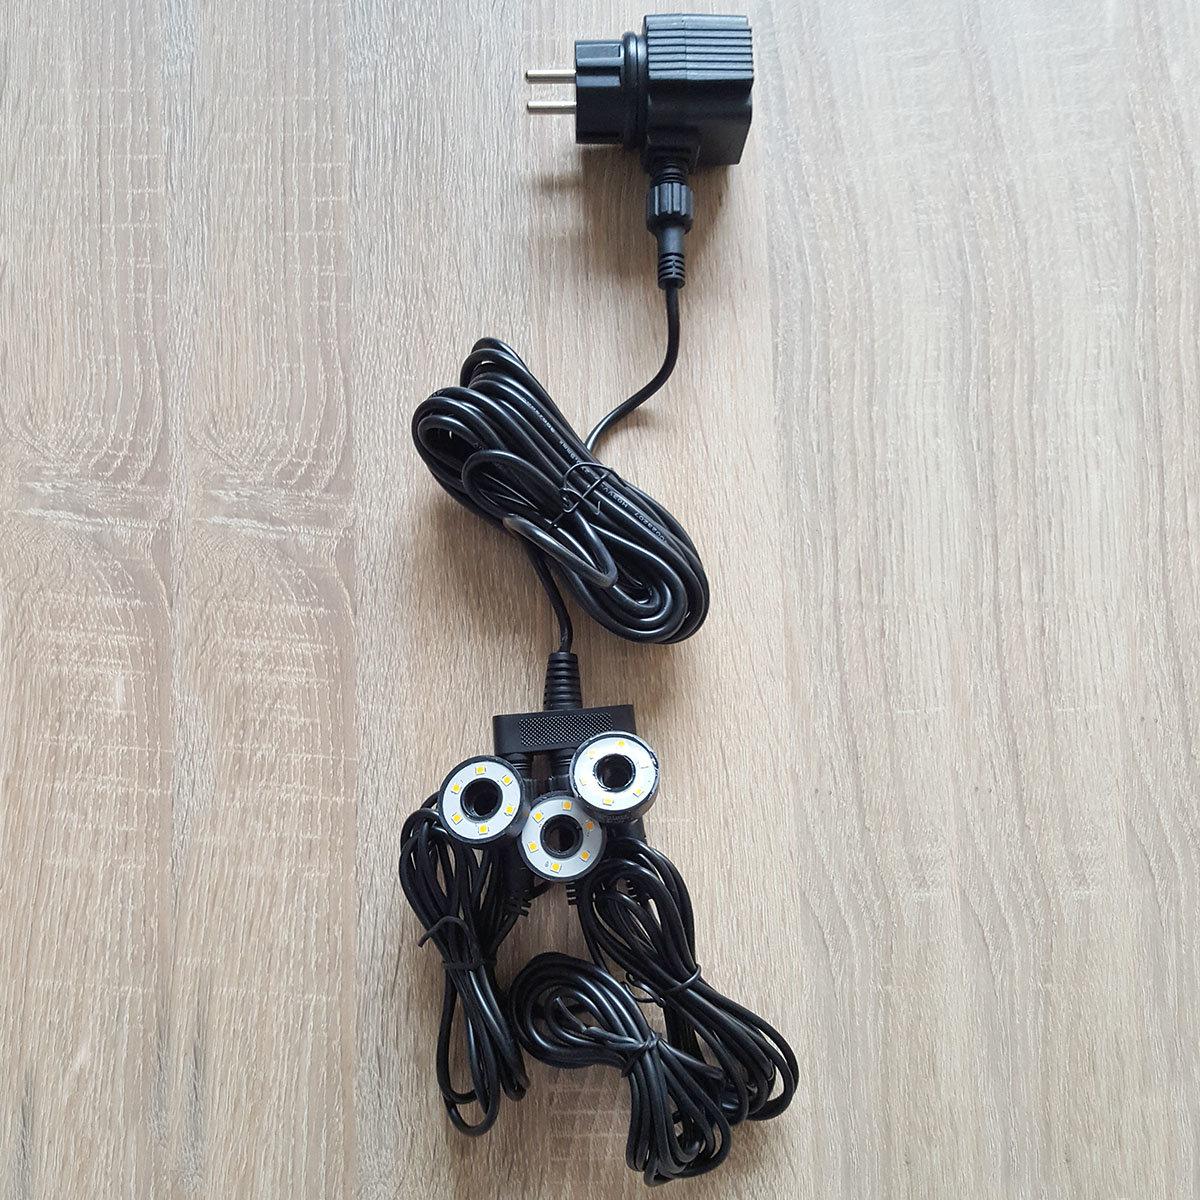 LED-Ring 32mm warmweiss mit Trafo, 3er-Set | #2